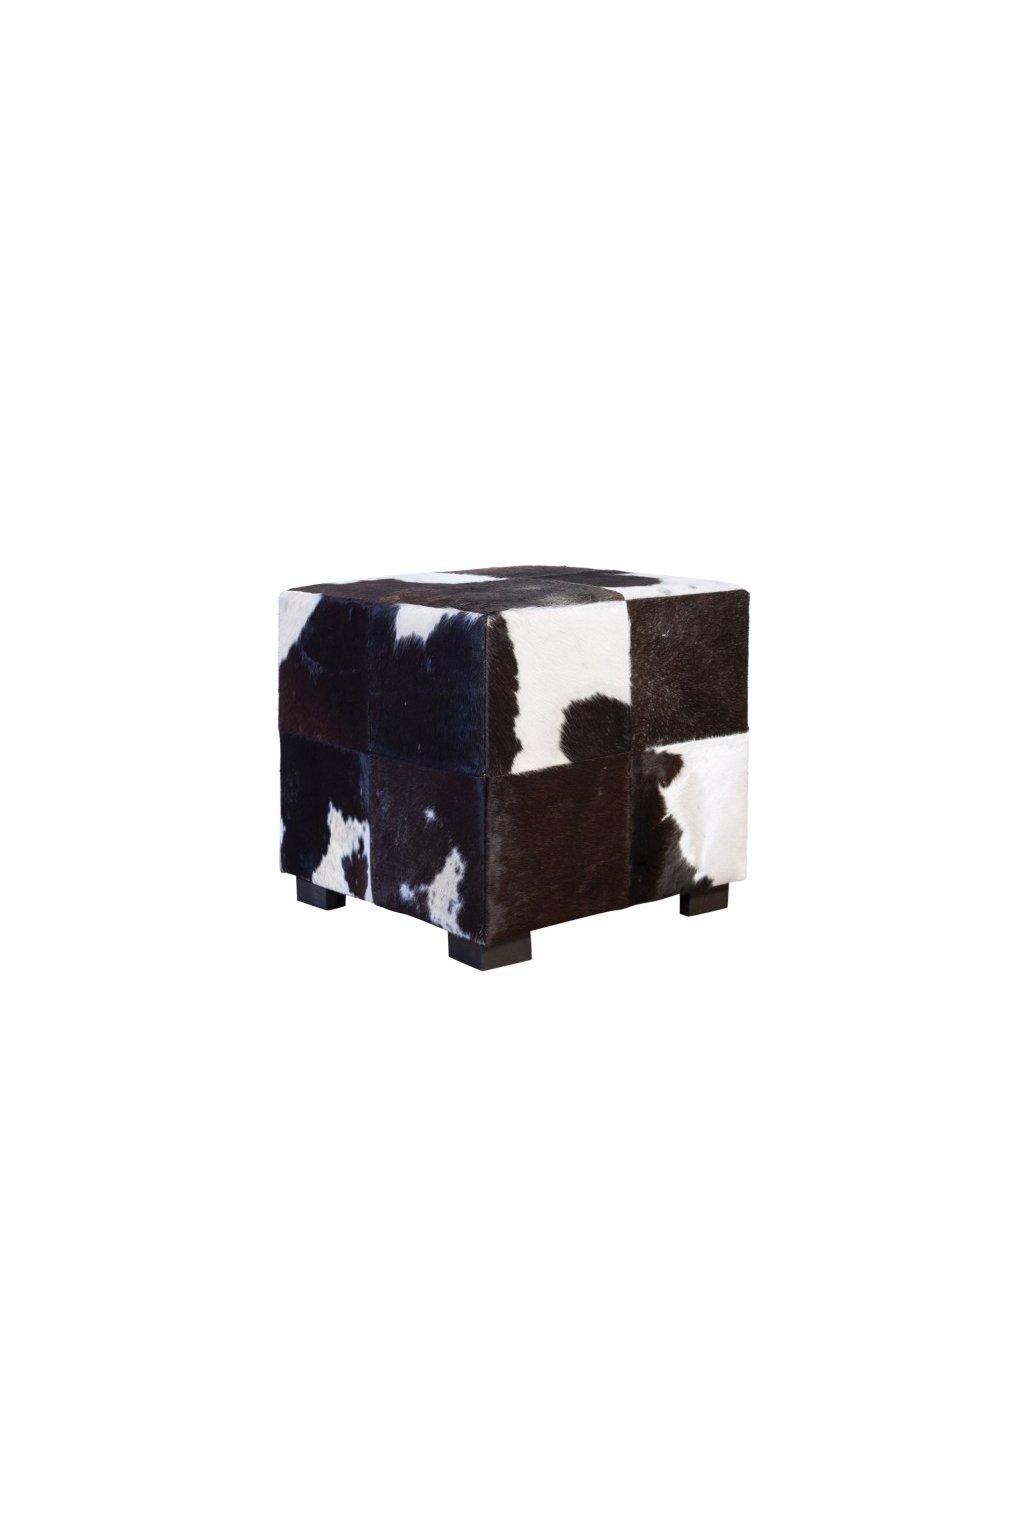 Fellhocker schwarz weiss 45x45x45